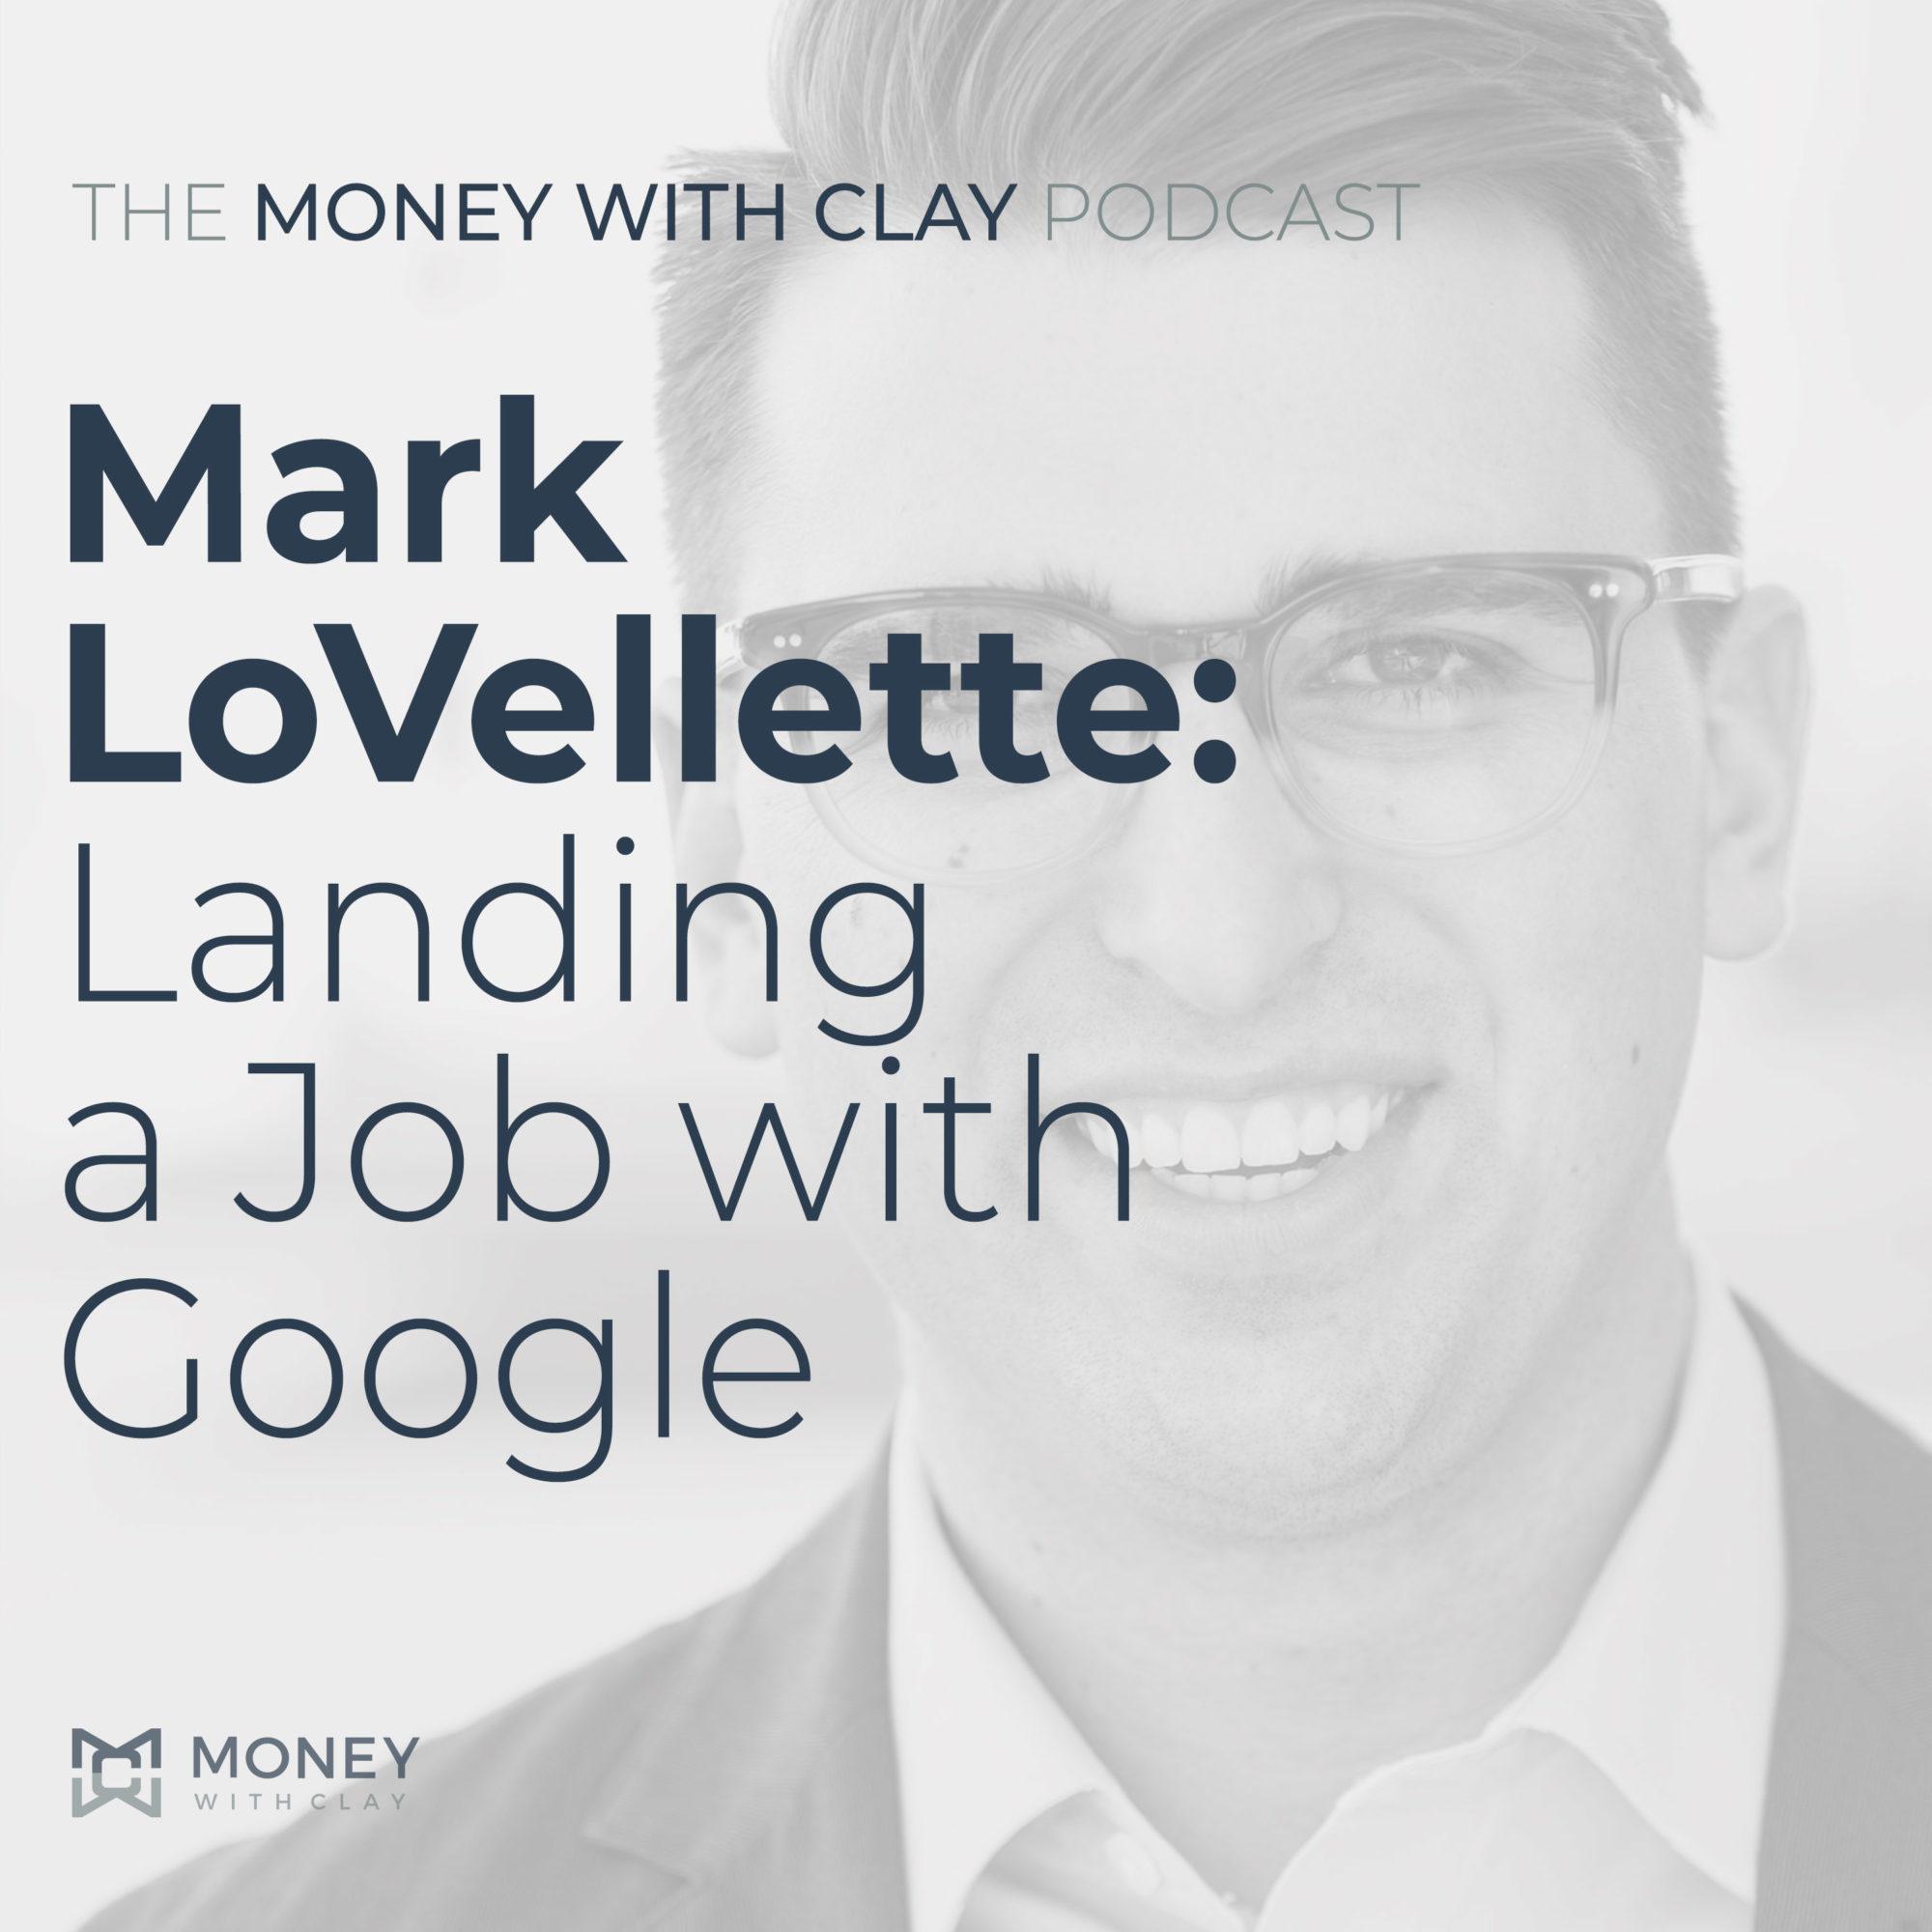 Mark LoVellette: Landing a Job with Google